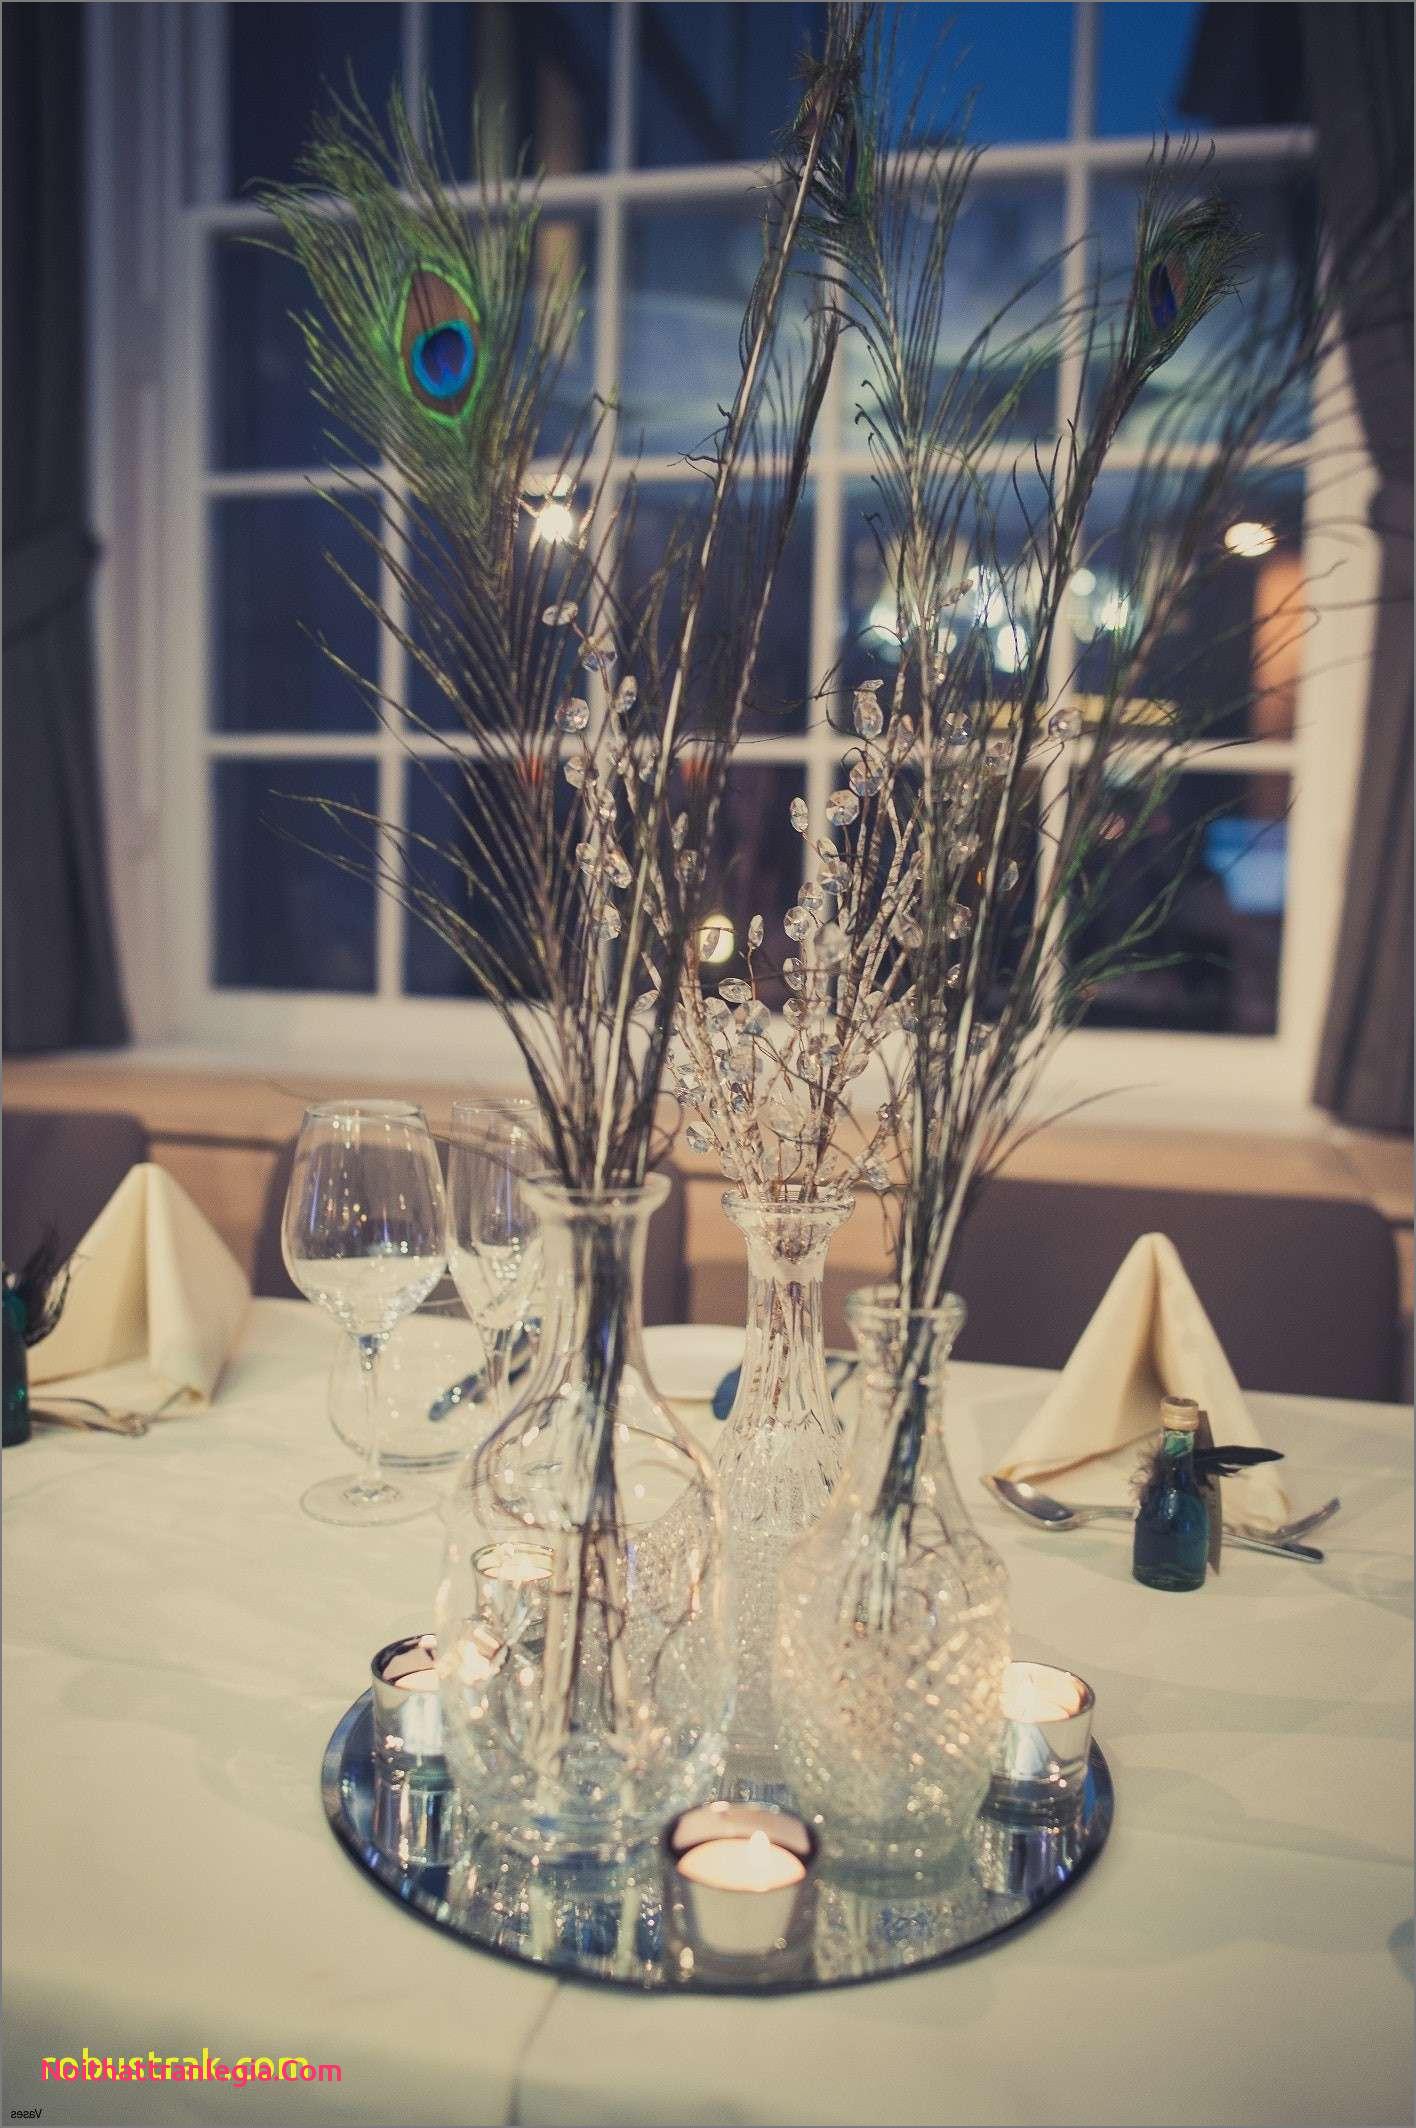 guest book vase of 20 wedding vases noithattranlegia vases design inside dollar tree wedding decorations awesome h vases dollar vase i 0d scheme doller tree